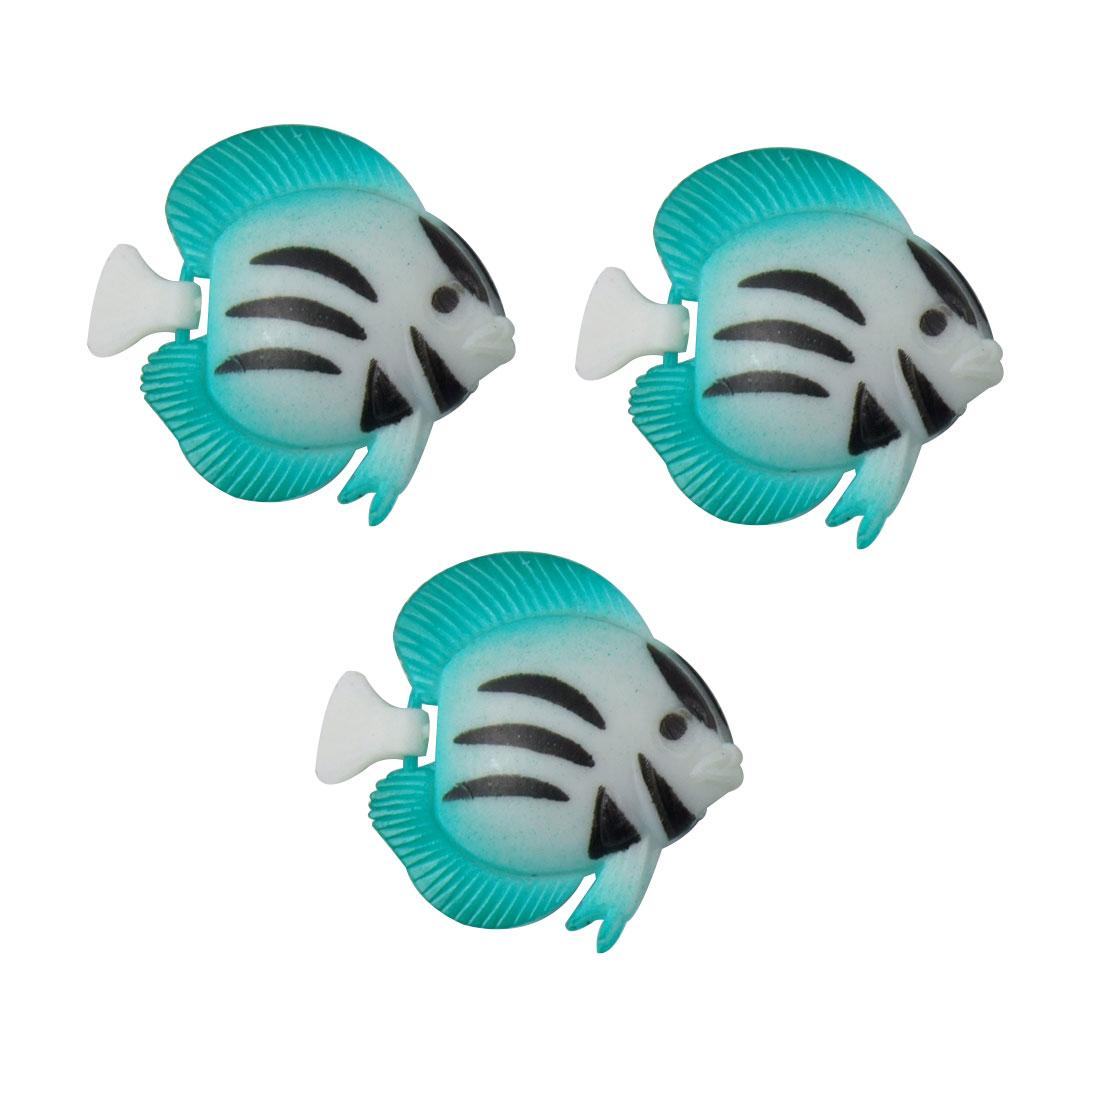 Aquarium Plastic Black Striped Floating Fish Ornament 3 Pcs